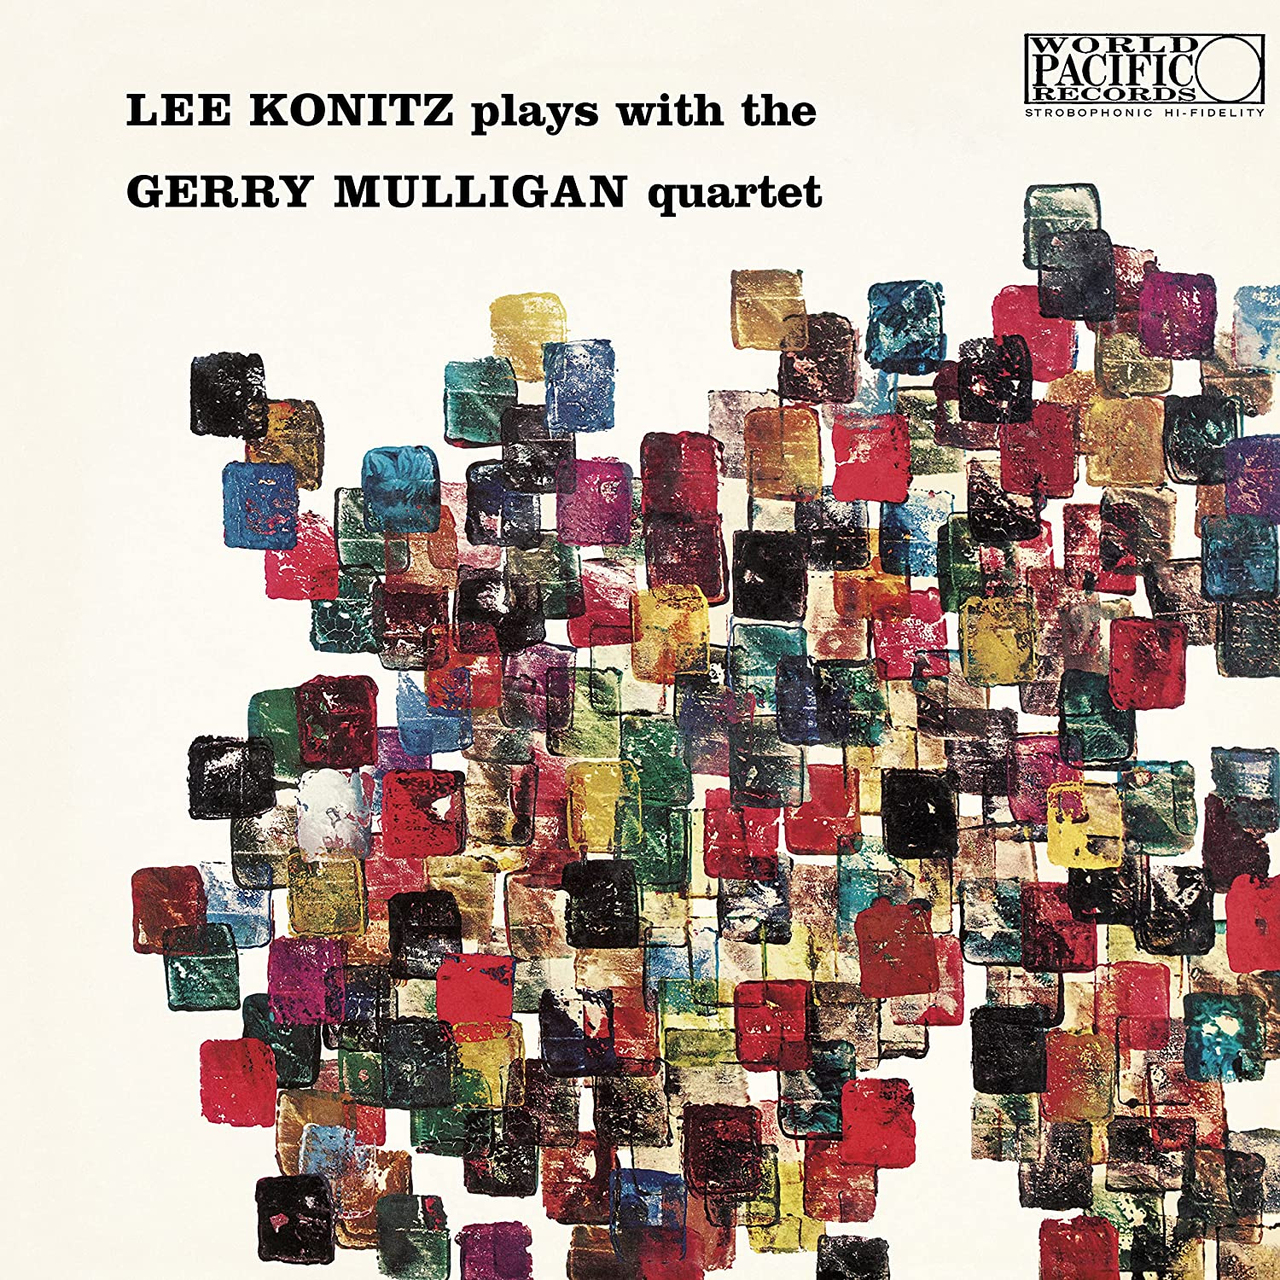 Lee Konitz & Gerry Mulligan - Lee Konitz Plays With The Gerry Mulligan Quartet [LP]